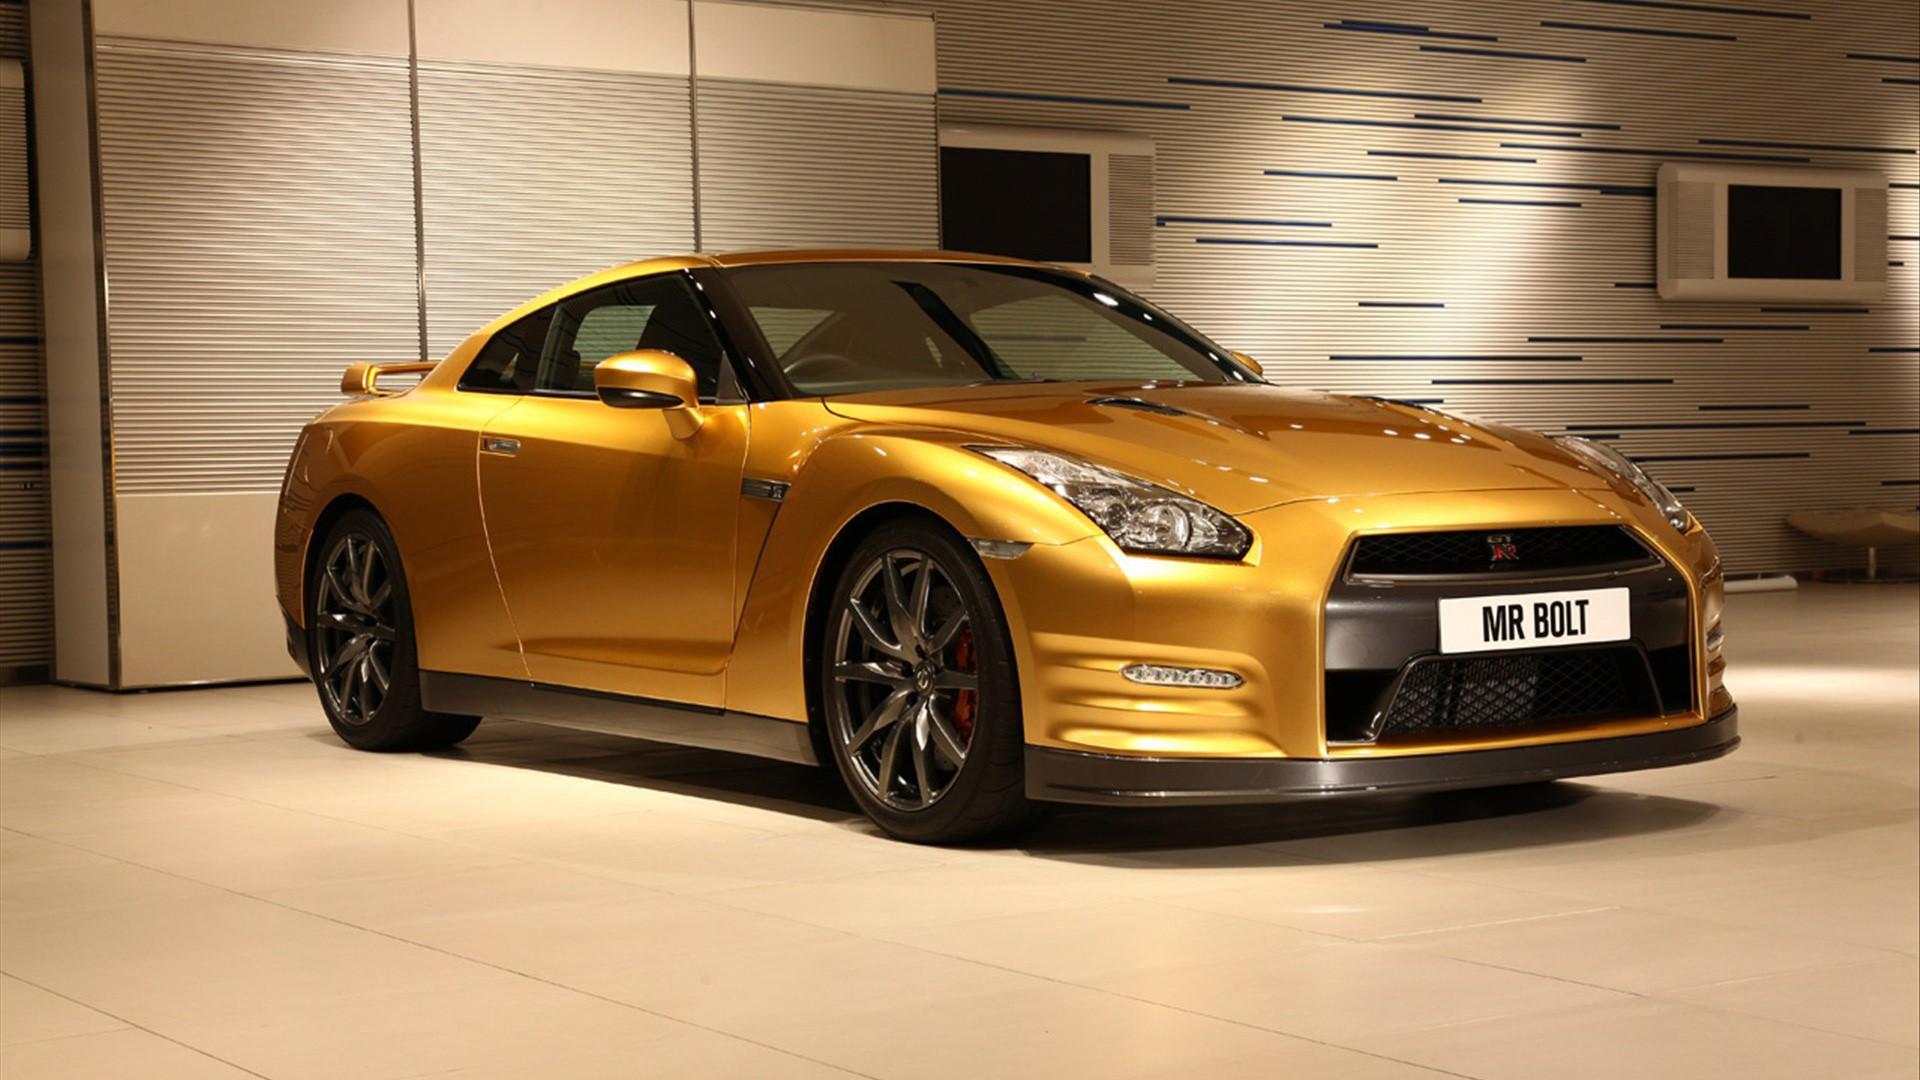 Nissan Gt R Gold Wallpaper Hd Car Wallpapers Id 3097